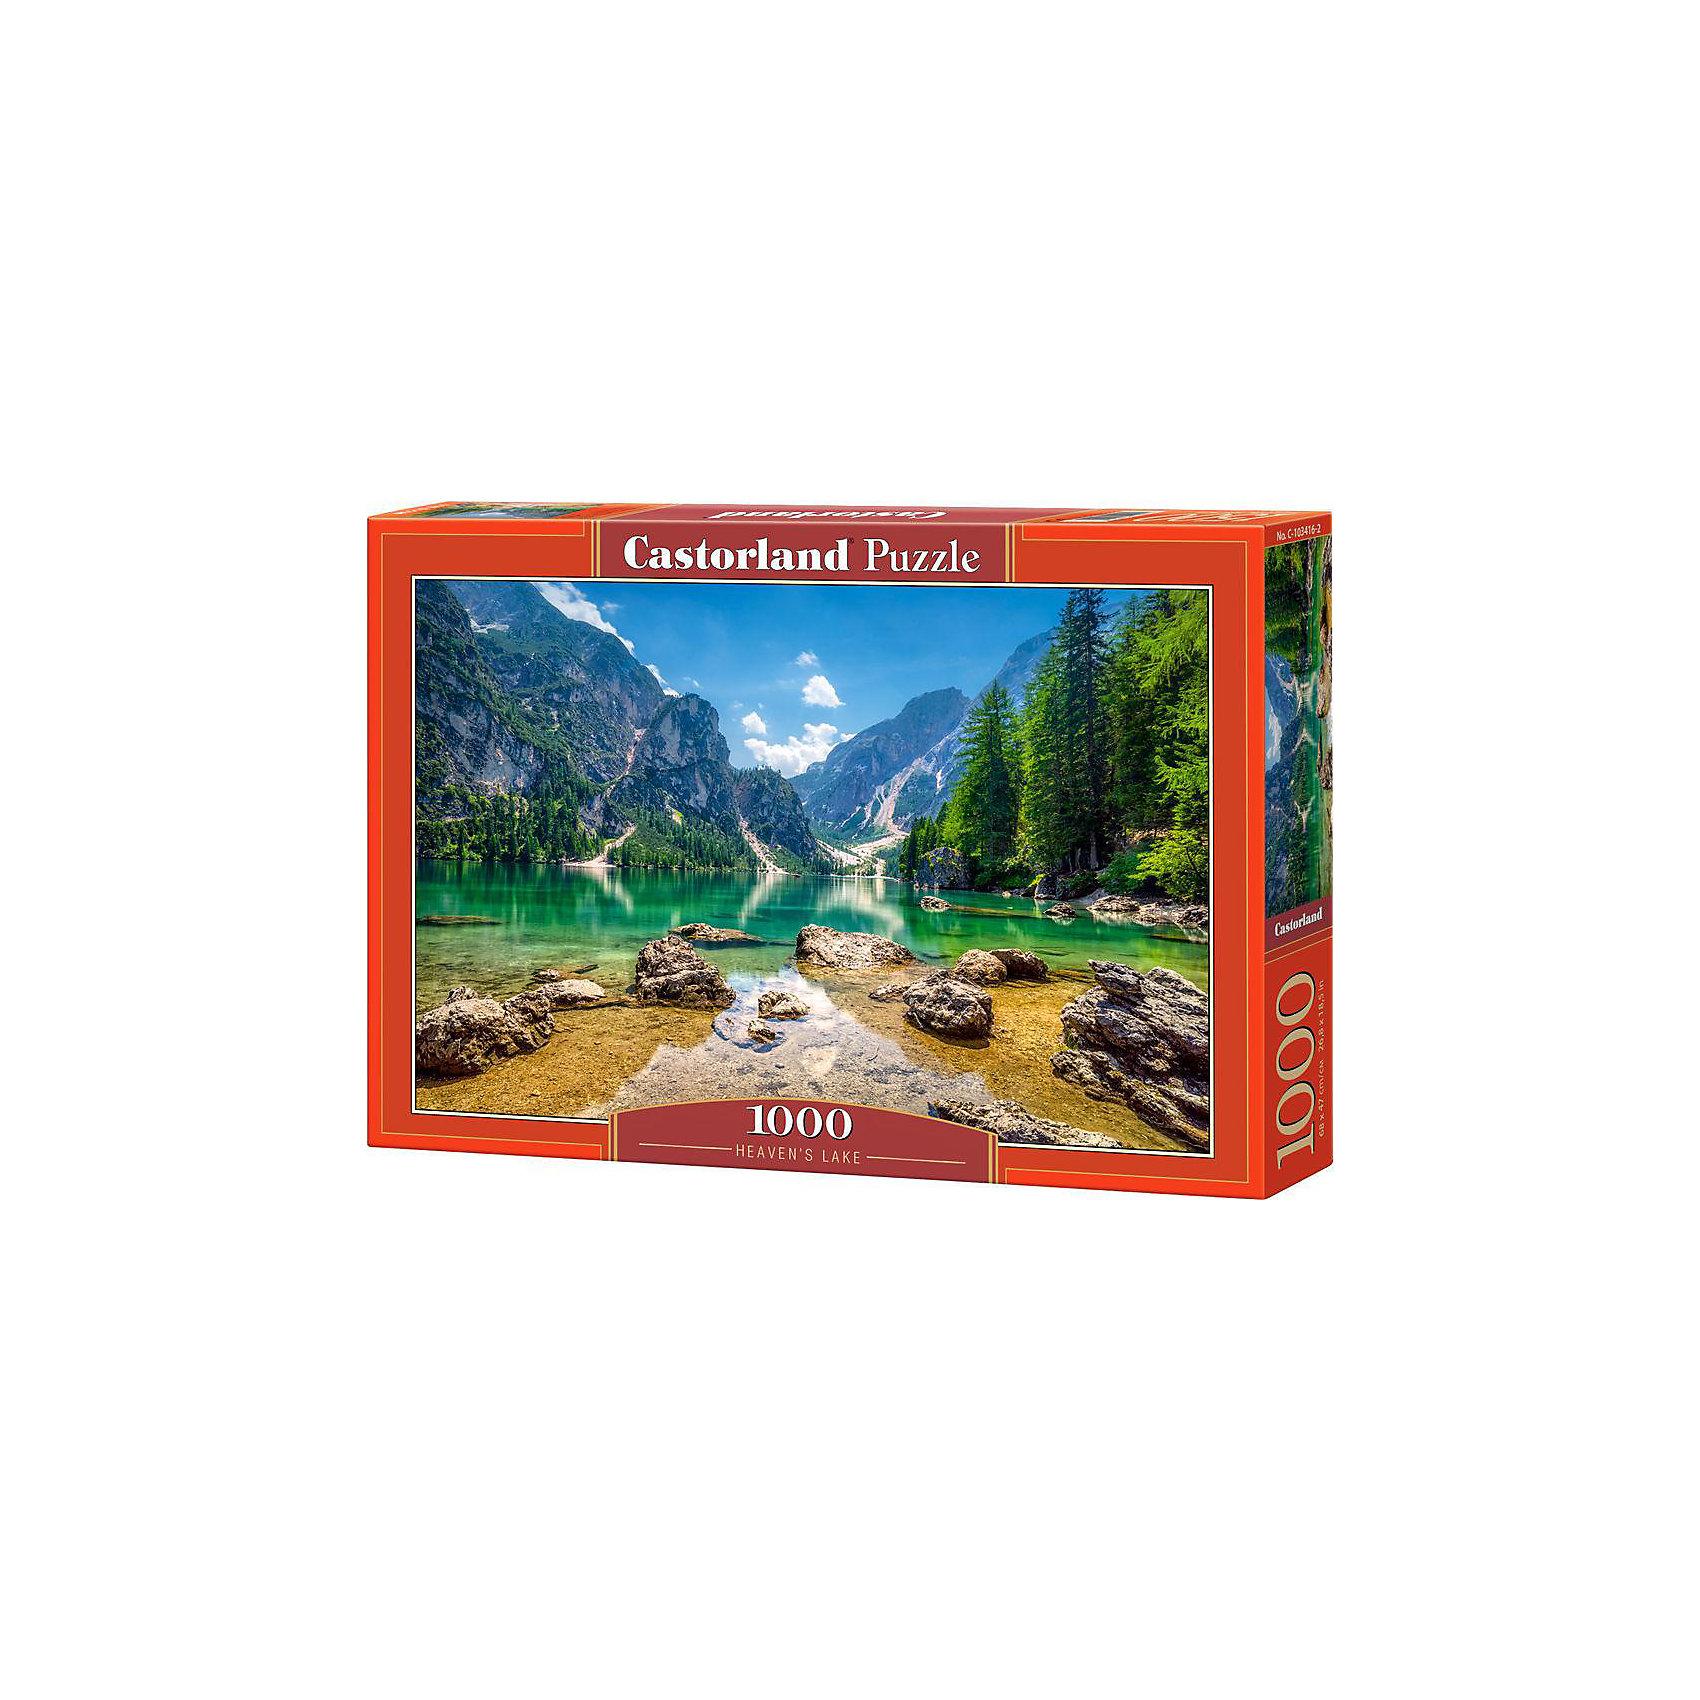 Пазл Озеро в горах, 1000 деталей, CastorlandКлассические пазлы<br><br><br>Ширина мм: 350<br>Глубина мм: 50<br>Высота мм: 250<br>Вес г: 500<br>Возраст от месяцев: 168<br>Возраст до месяцев: 1188<br>Пол: Унисекс<br>Возраст: Детский<br>SKU: 4879215